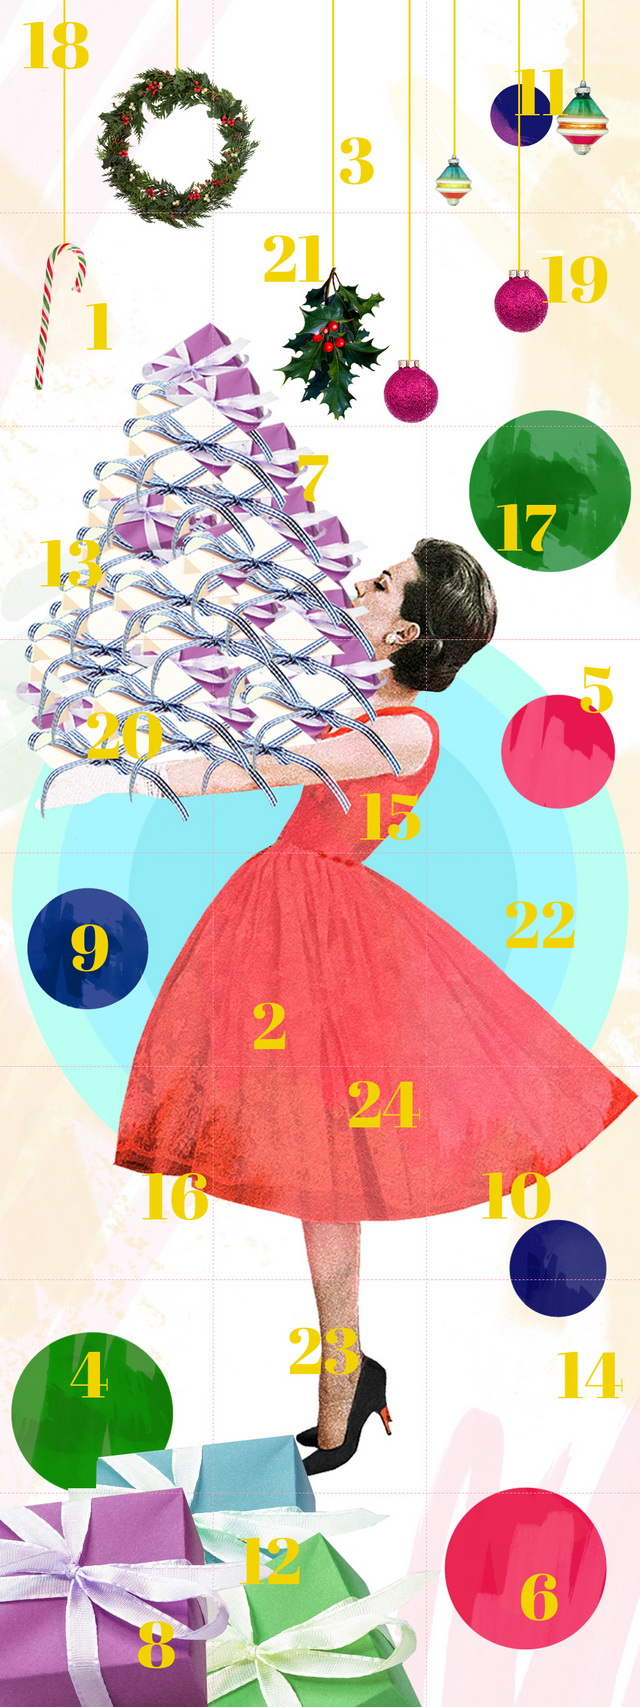 advent calendar illustration for myself.de by laura redburn » cardboardcities - creative lifestyle blog